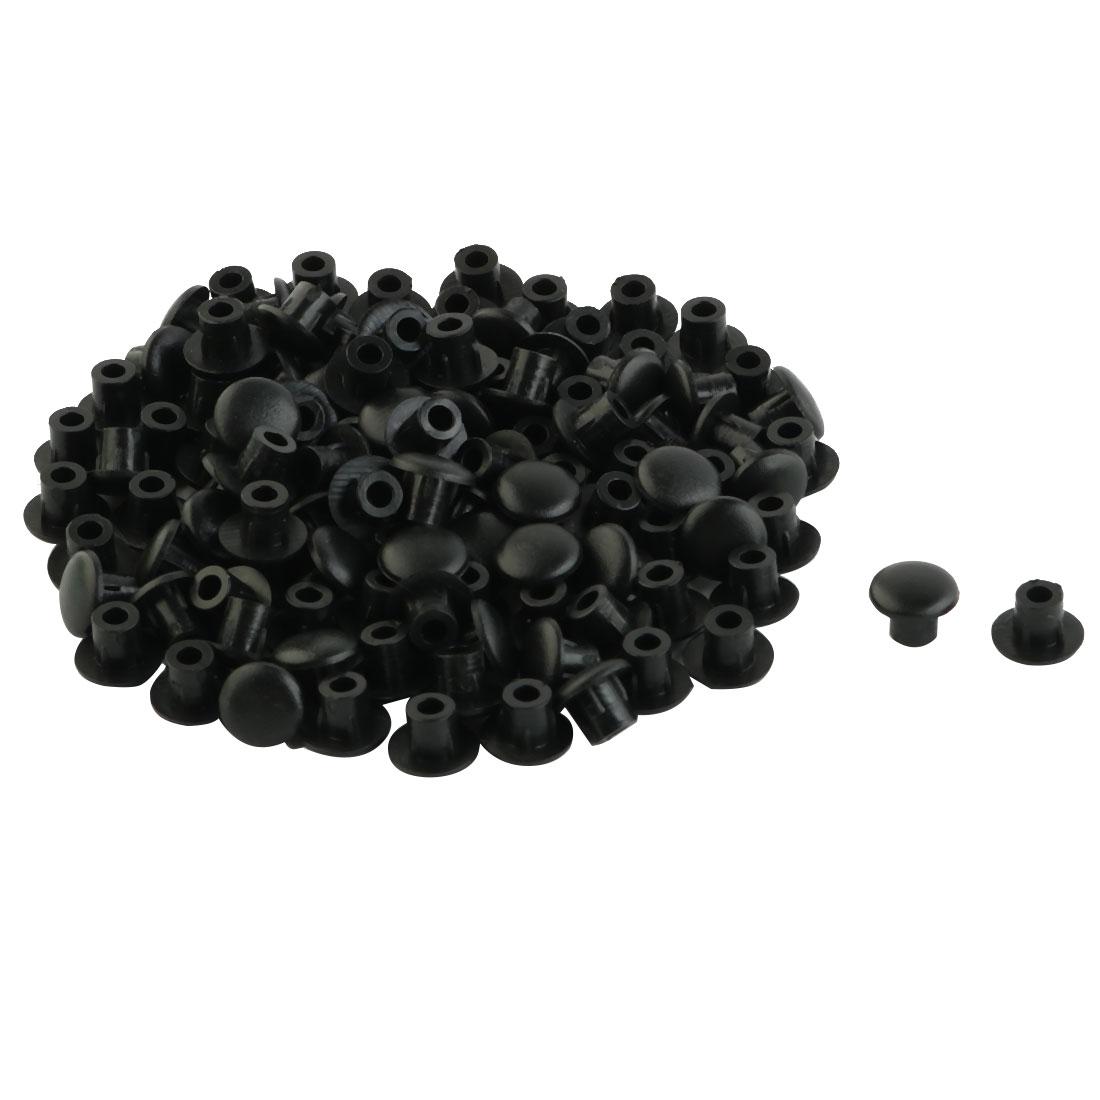 Home Furniture Decor 4.5mm Black Plastic Hole Drilling Cover Plugs 100pcs